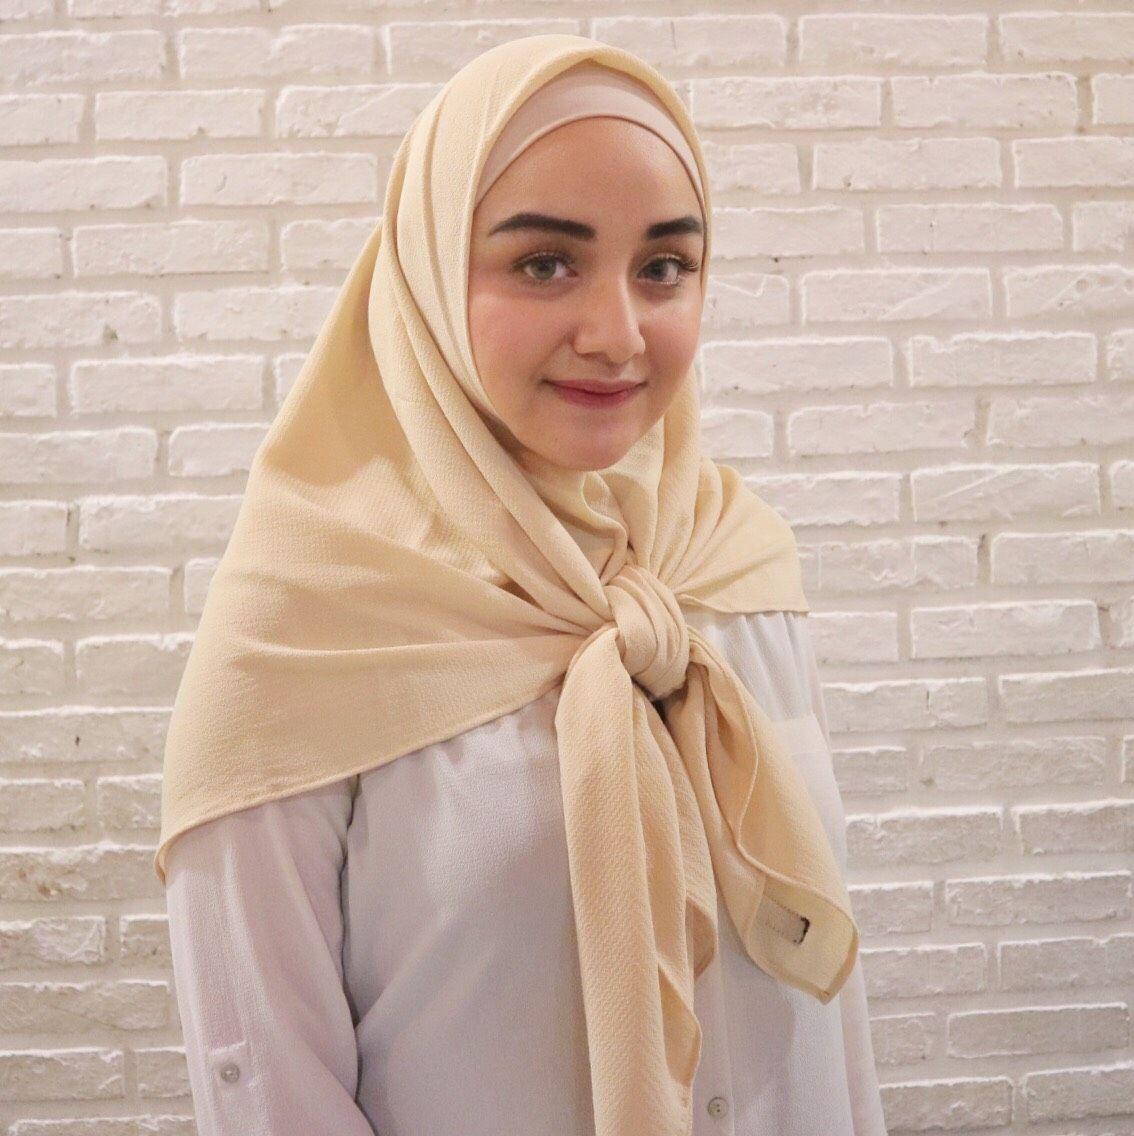 Pusat Grosir Hijab Murah Dan Berkualitas Di Malang Hijab Wanita Malang